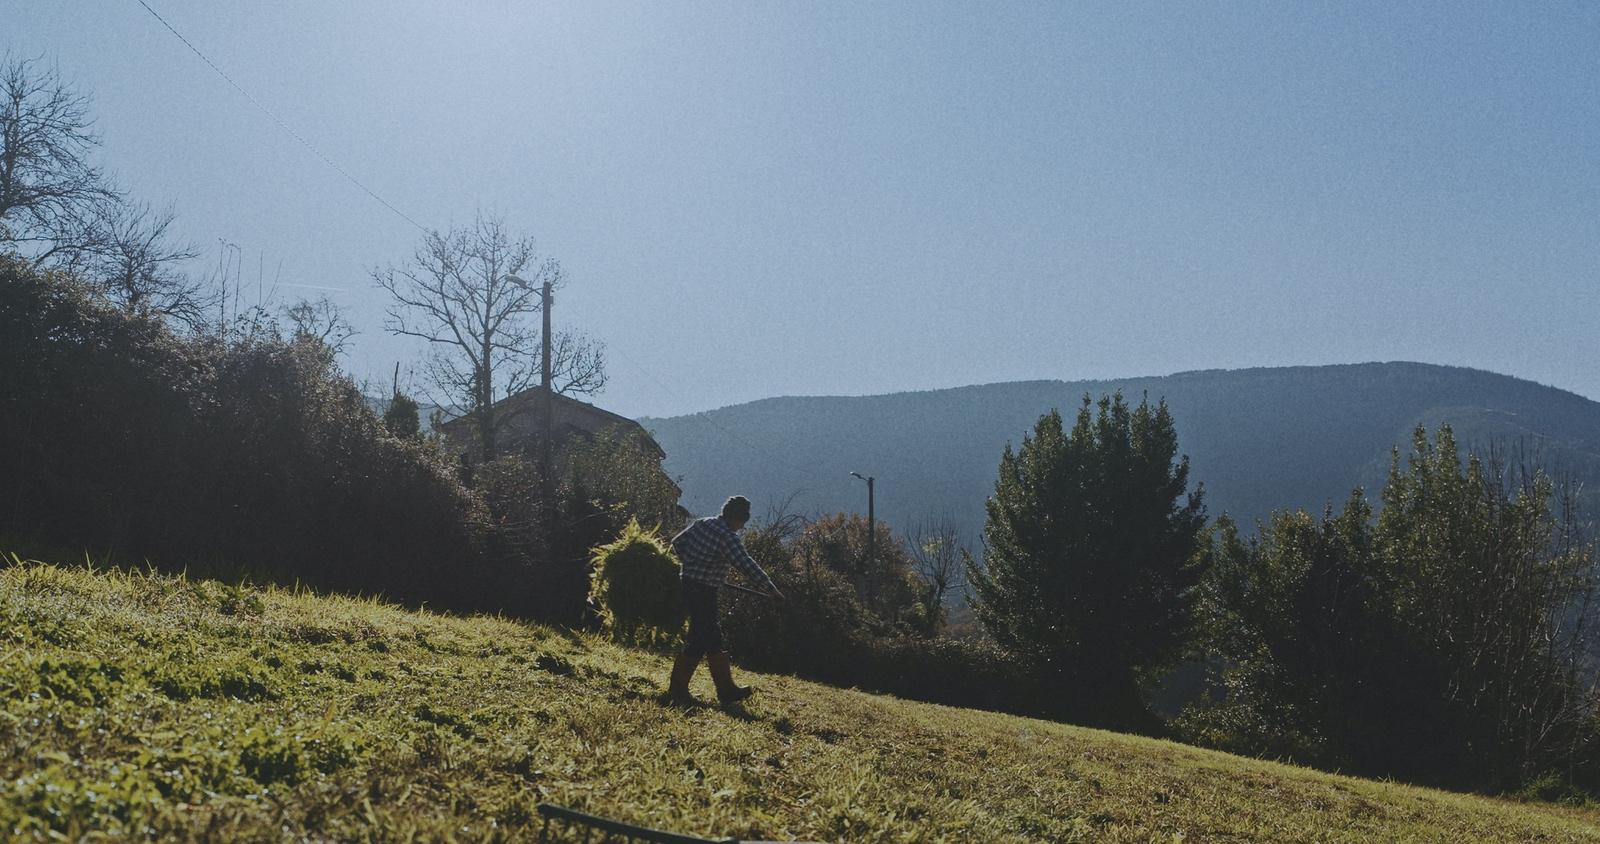 Persoa, Pobo, Paisaxe (Person, Village, Landscape)